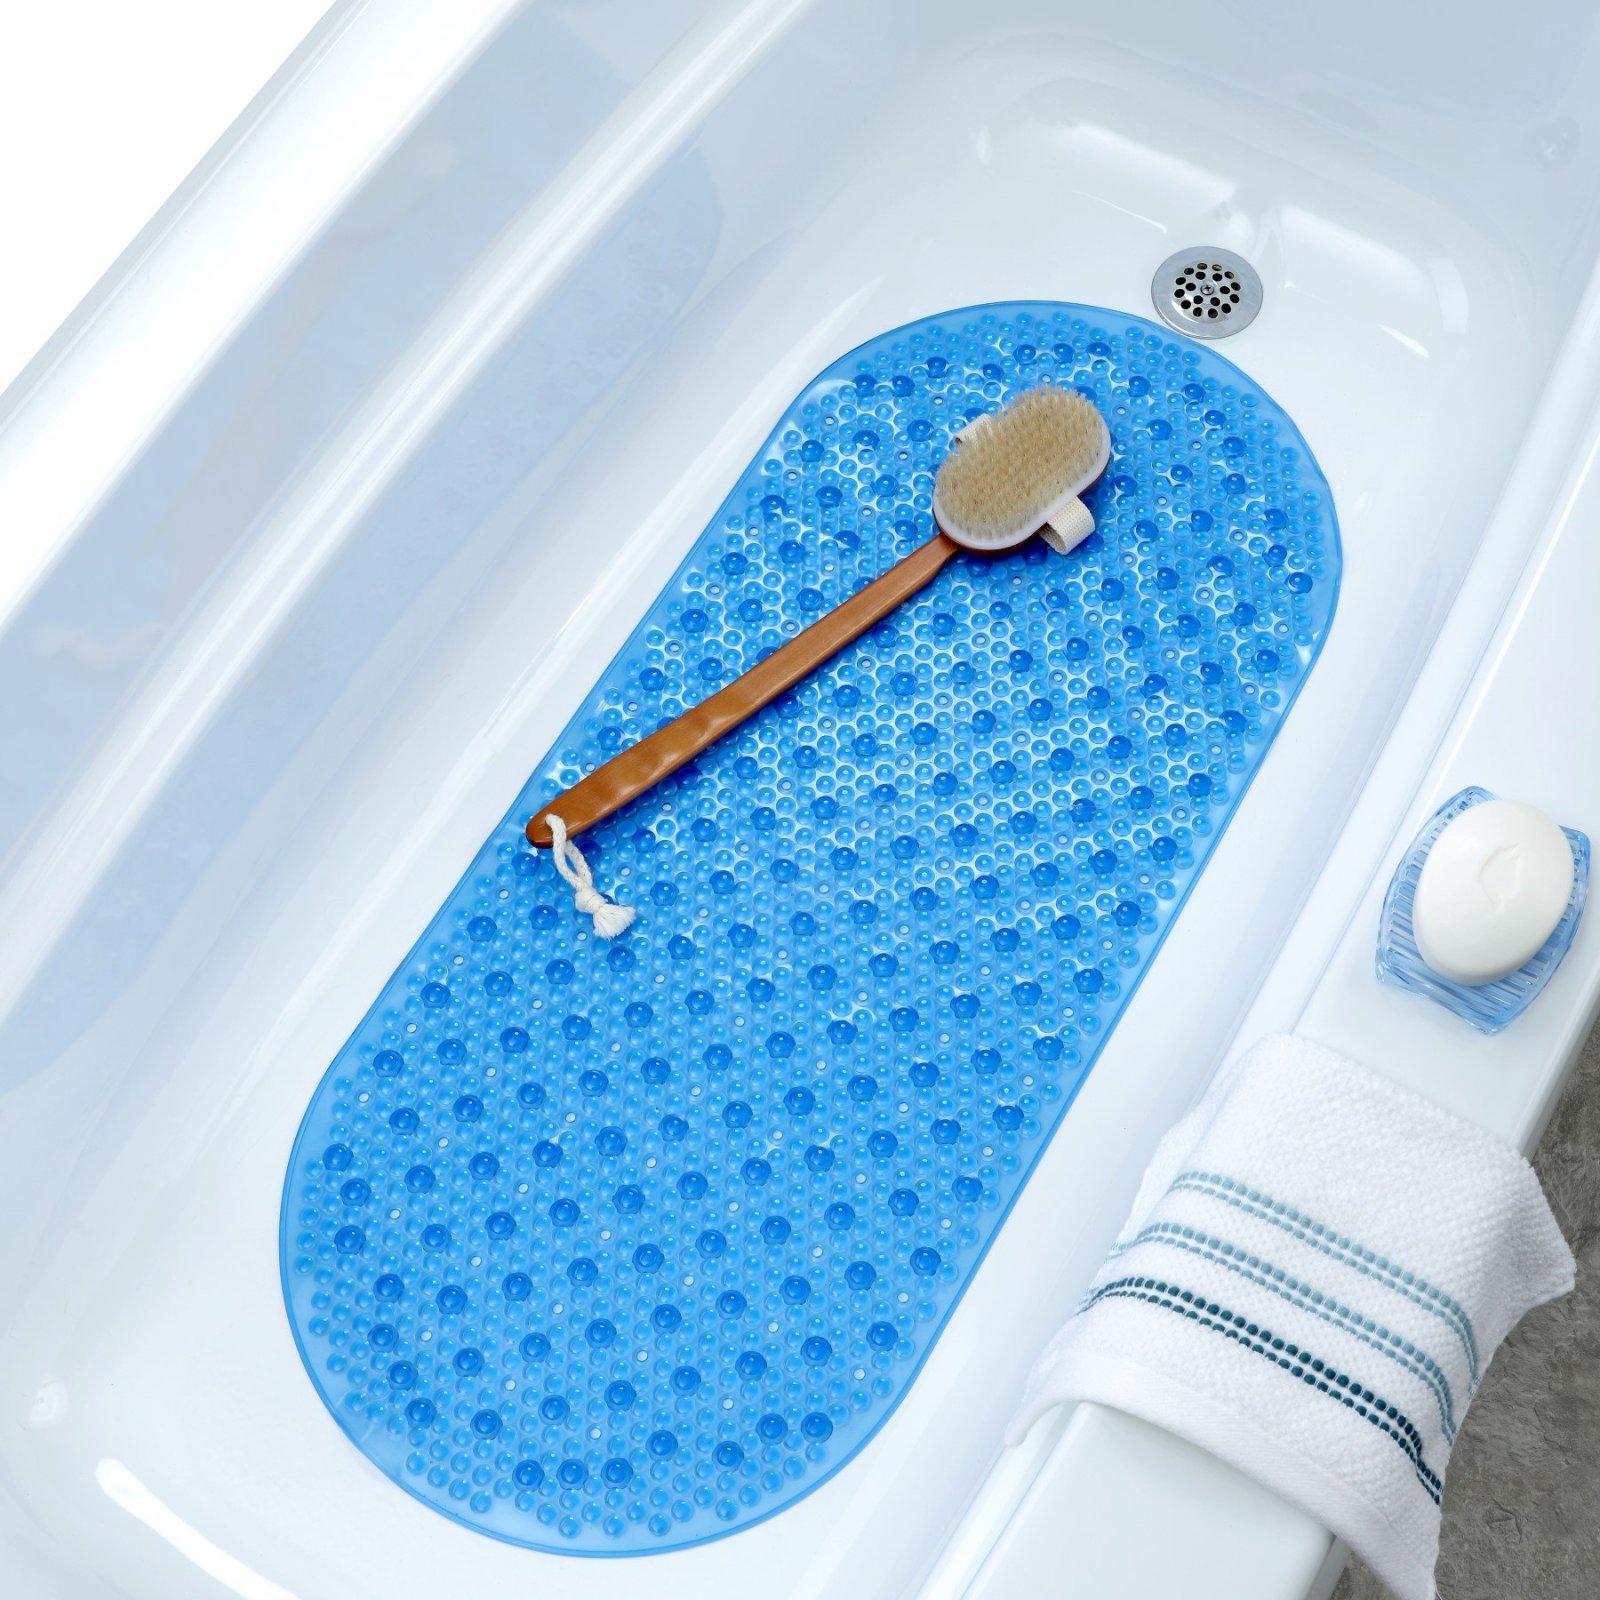 Tapete De Banheiro De Chuveiro Banheira Piso antiderrapante apliques ...